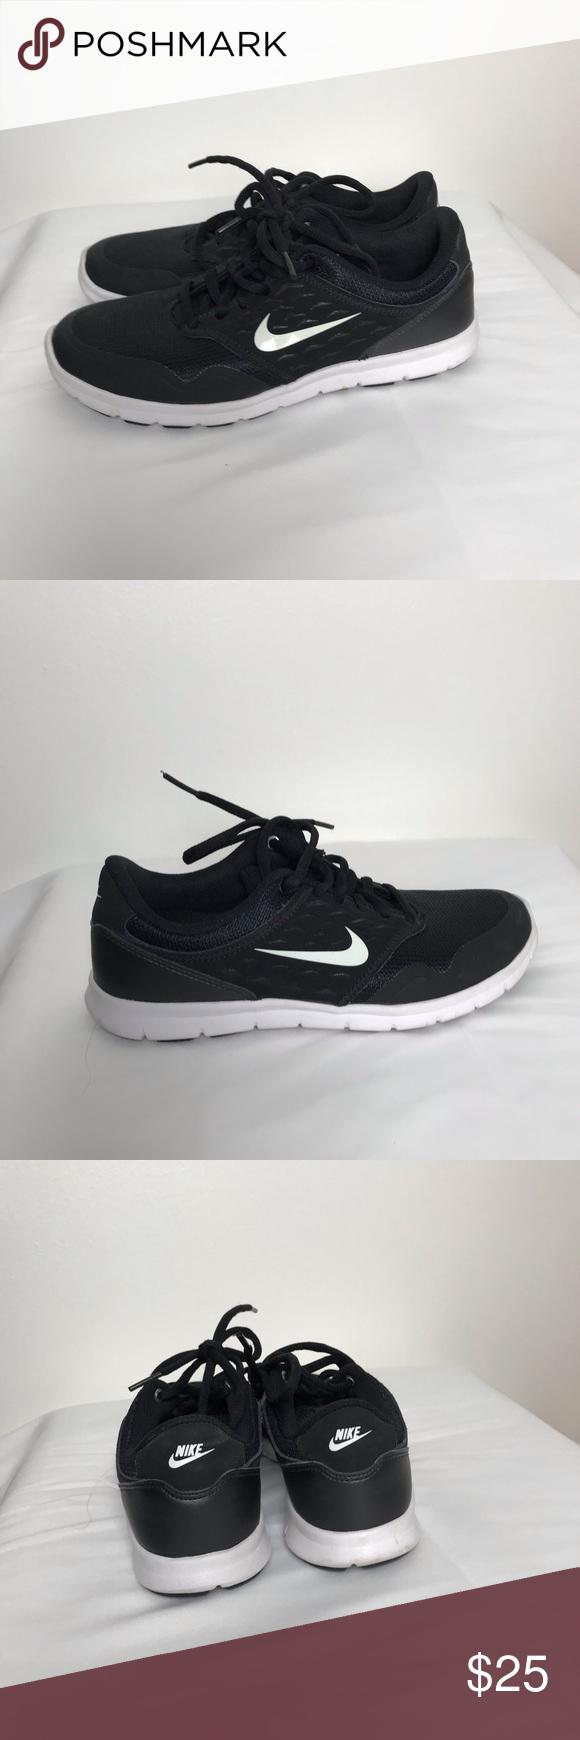 Nike black shoes Black Nike shoes with